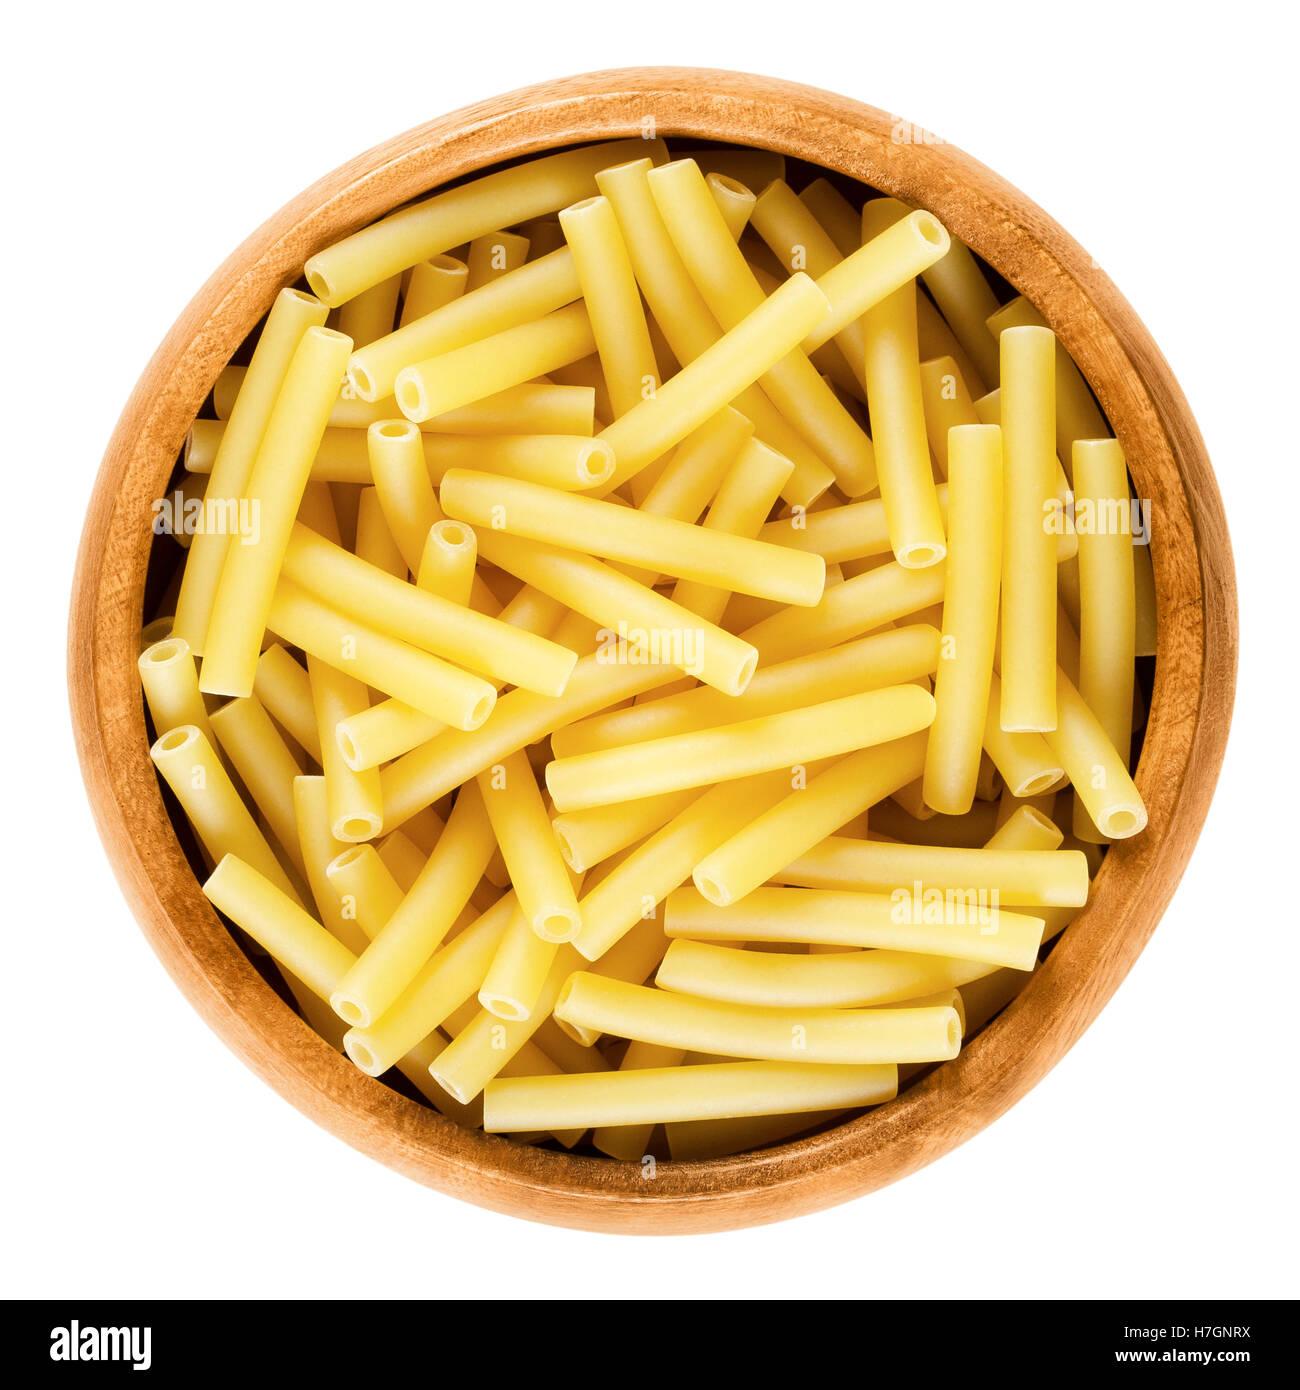 Macaroni pasta in wooden bowl, Italian maccheroni, short-cut noodles in the shape of narrow tubes. - Stock Image